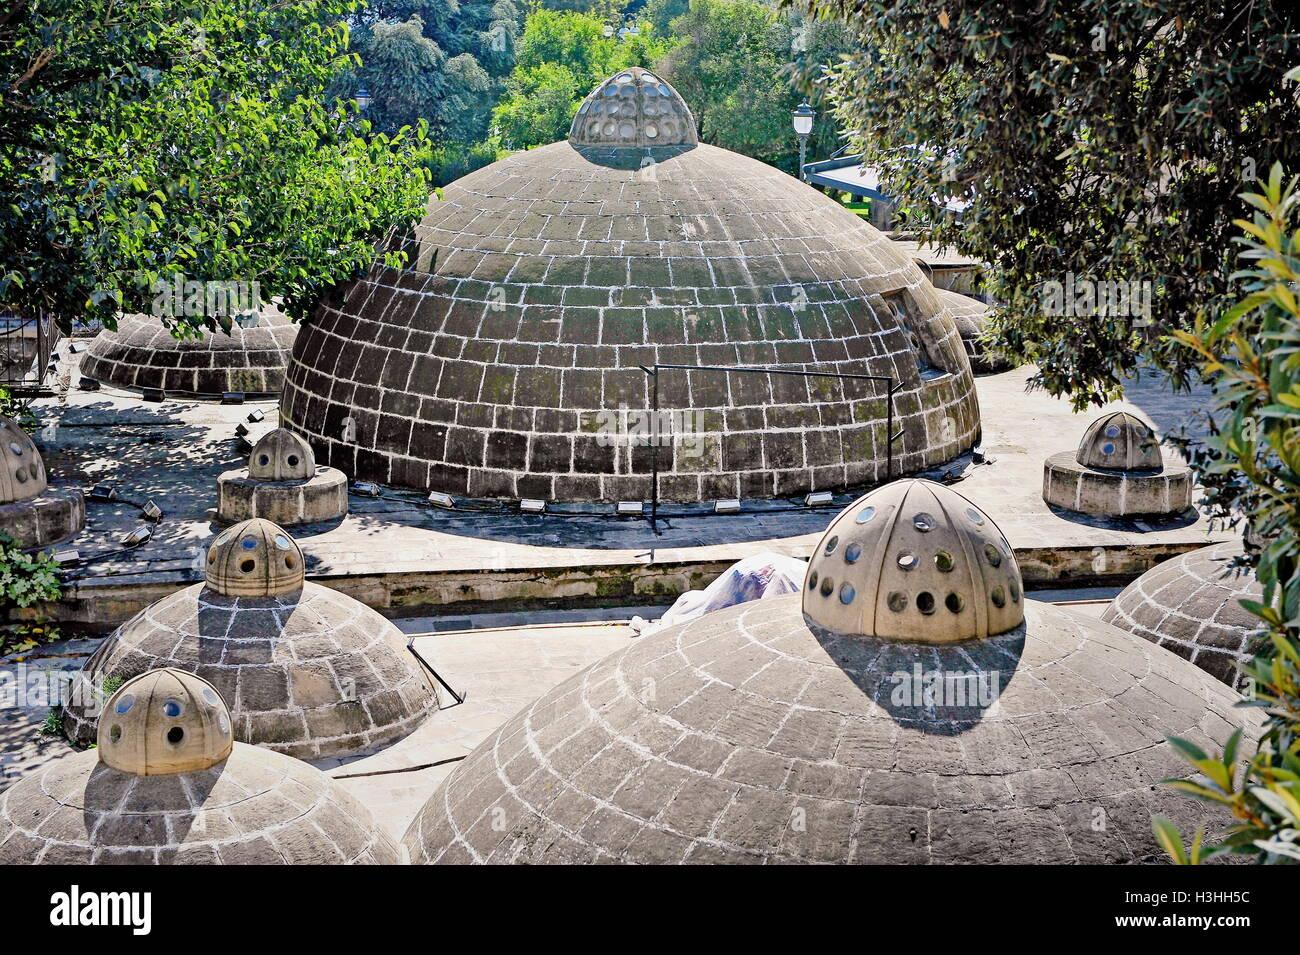 Sulfur baths of Baku old town, Azerbaijan - Stock Image